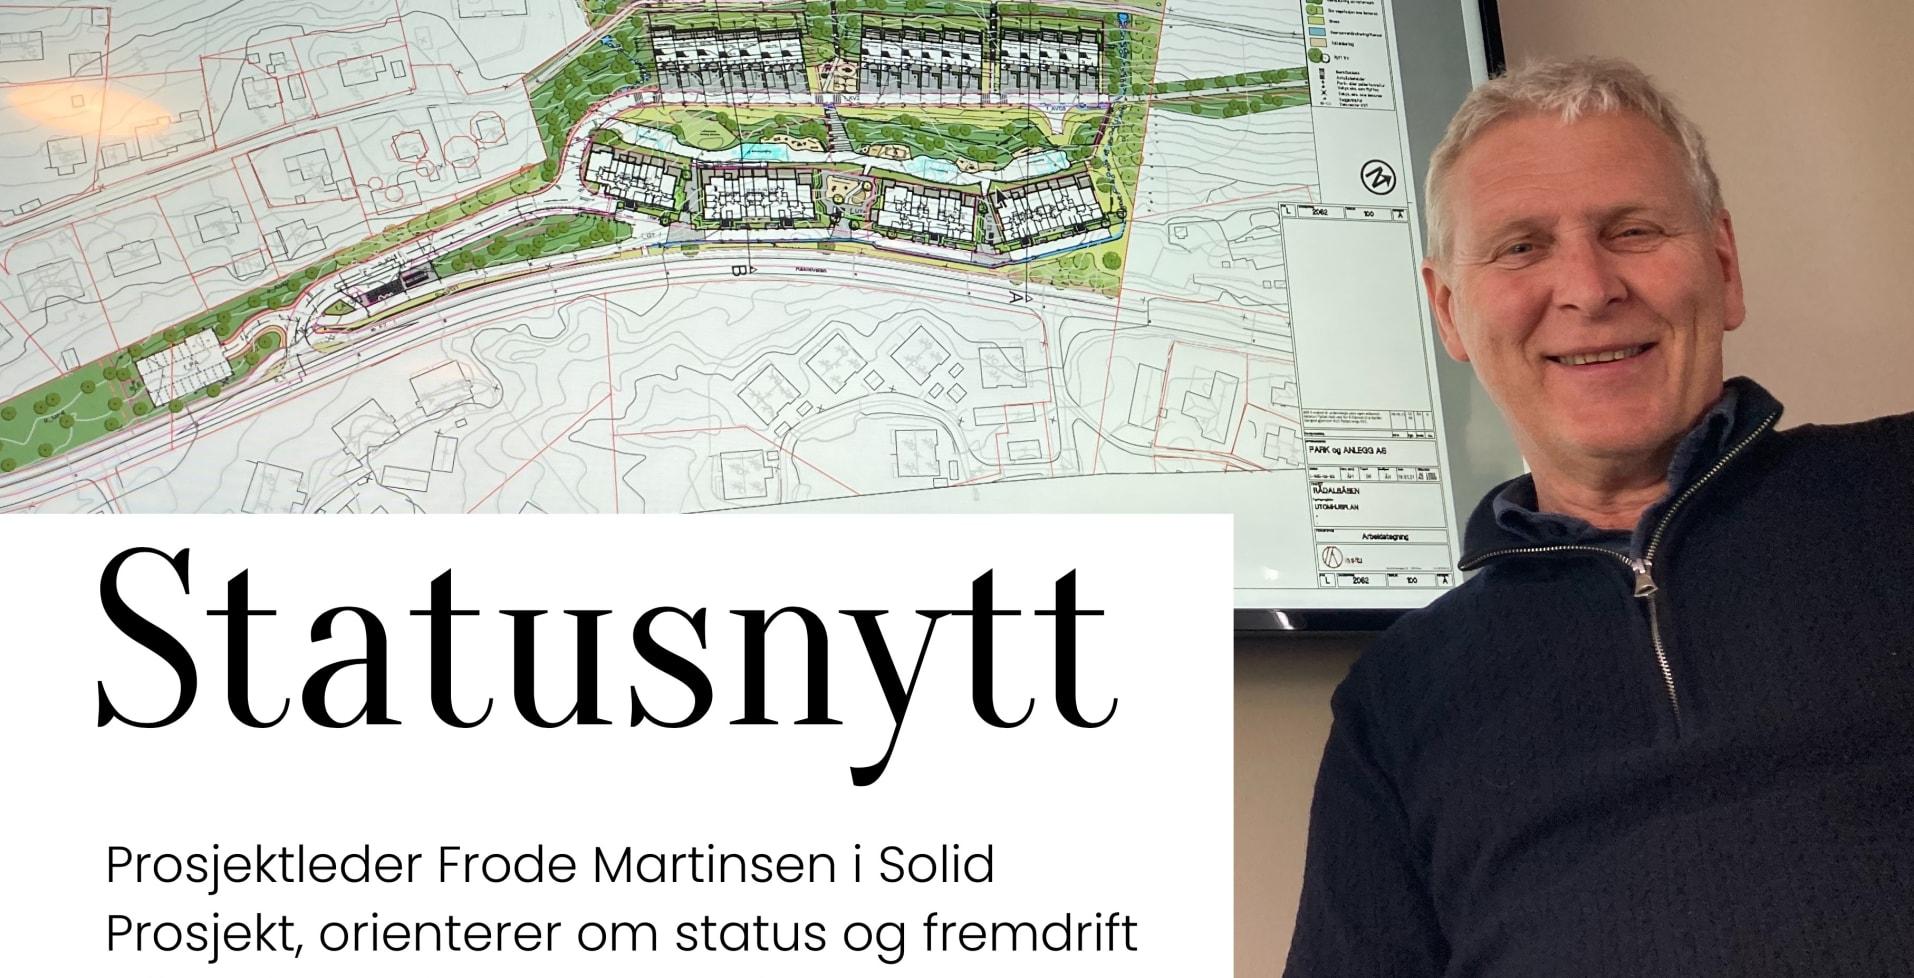 Prosjektleder i Solid Prosjekt, Frode Martinsen orienterer om Rådalsåsen